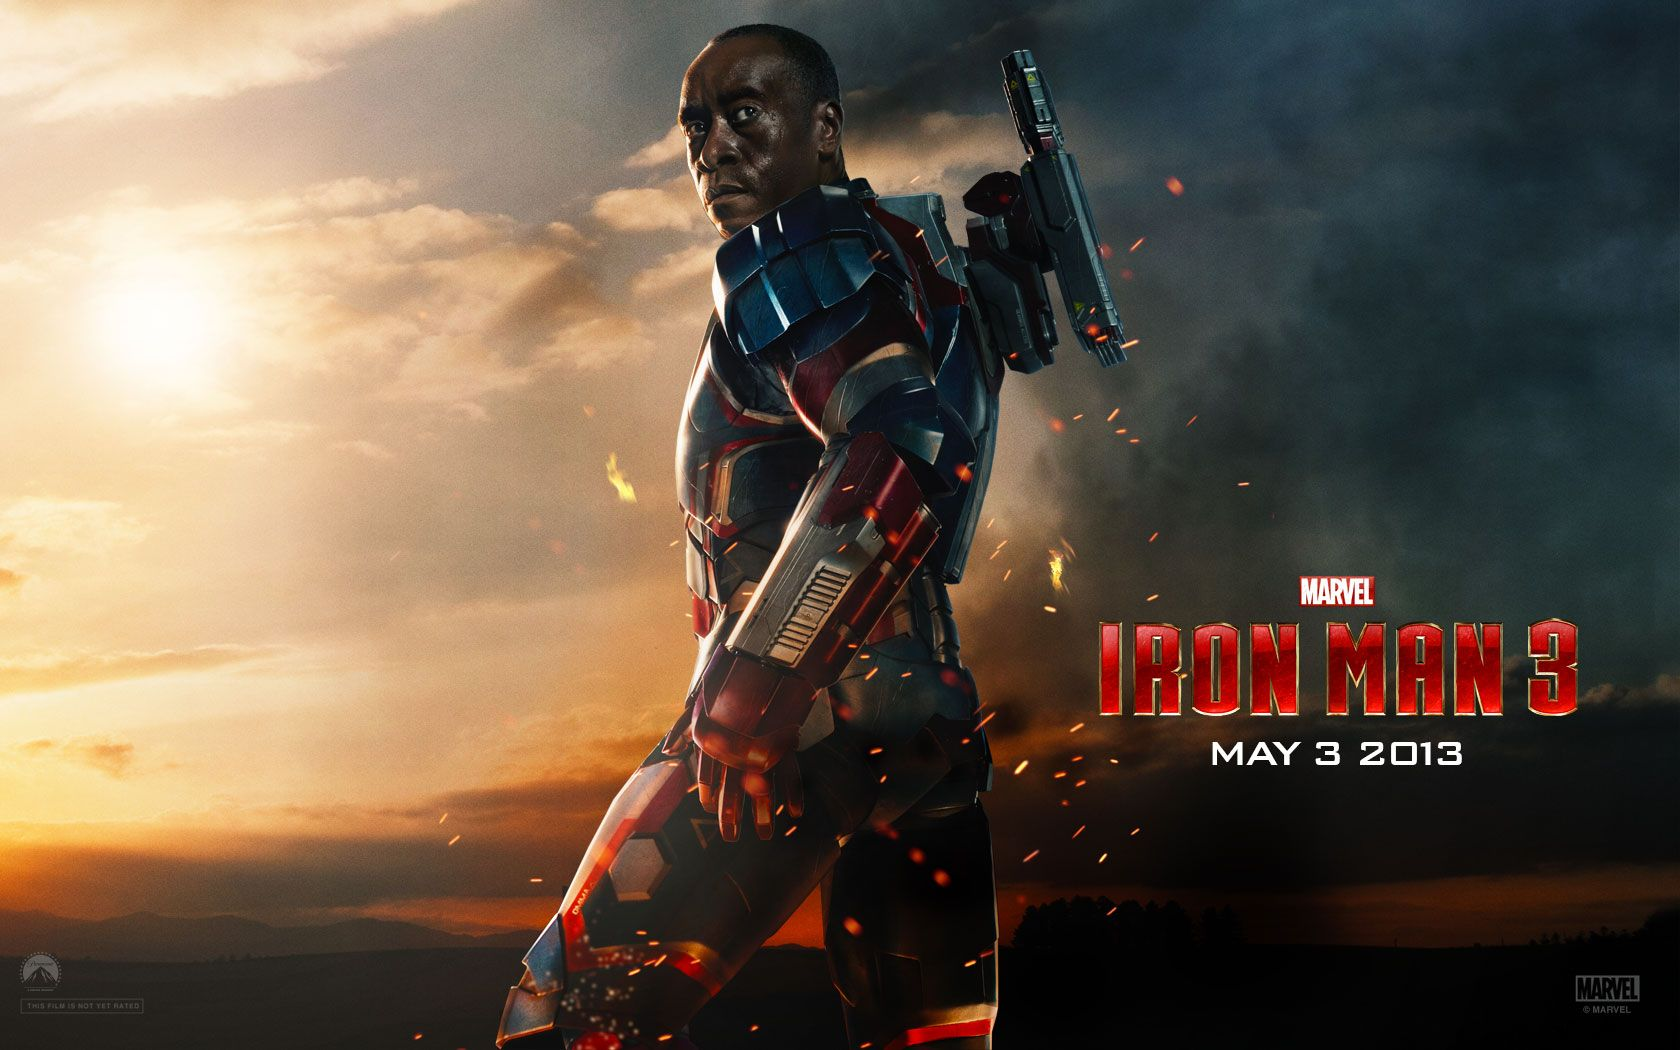 Iron Man 3 Wallpapers Top Free Iron Man 3 Backgrounds